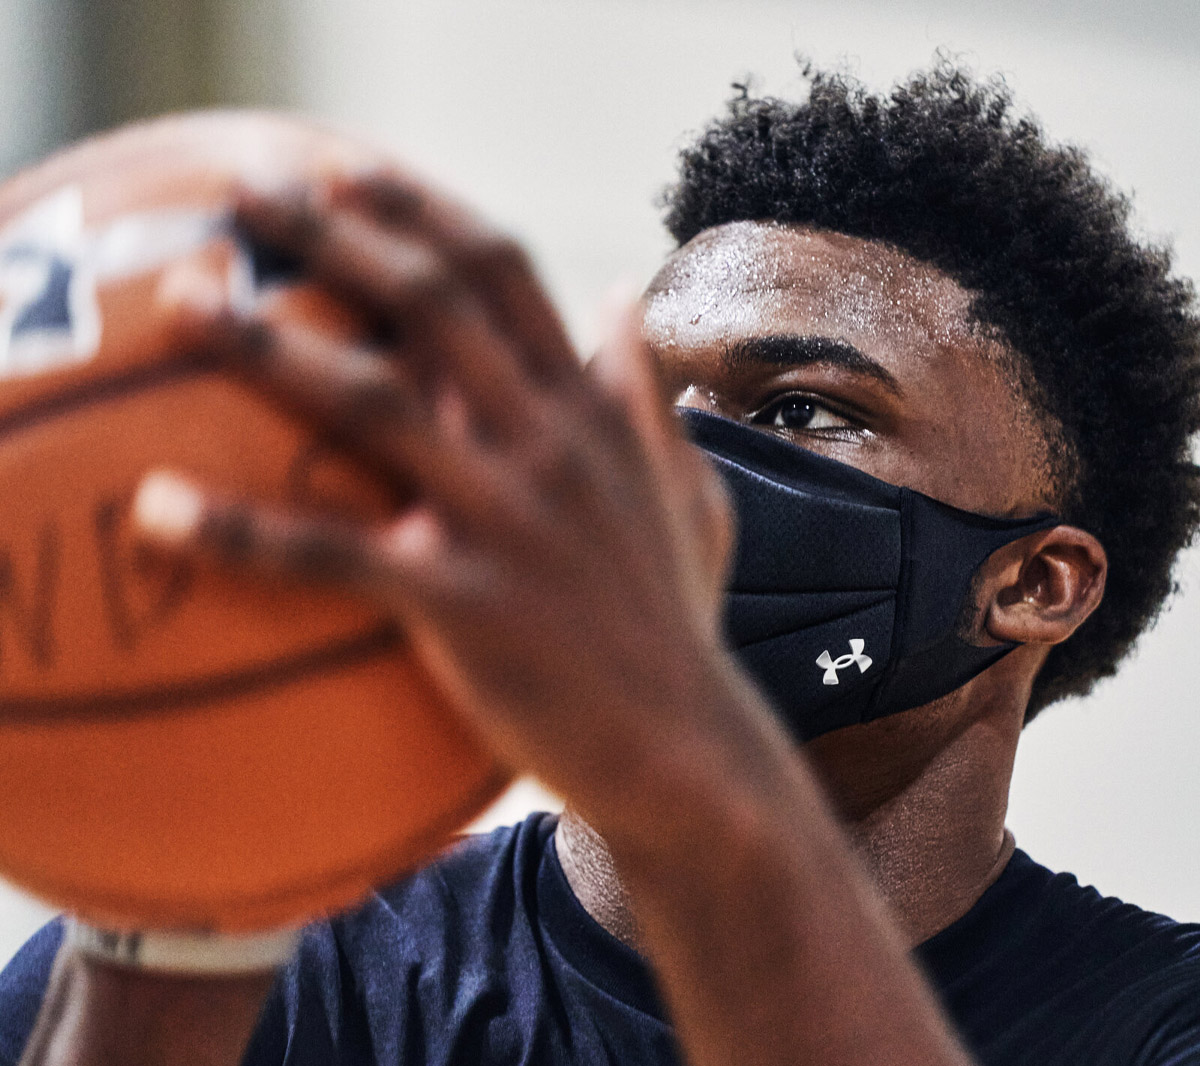 ua-sports-mask-des-2.jpg